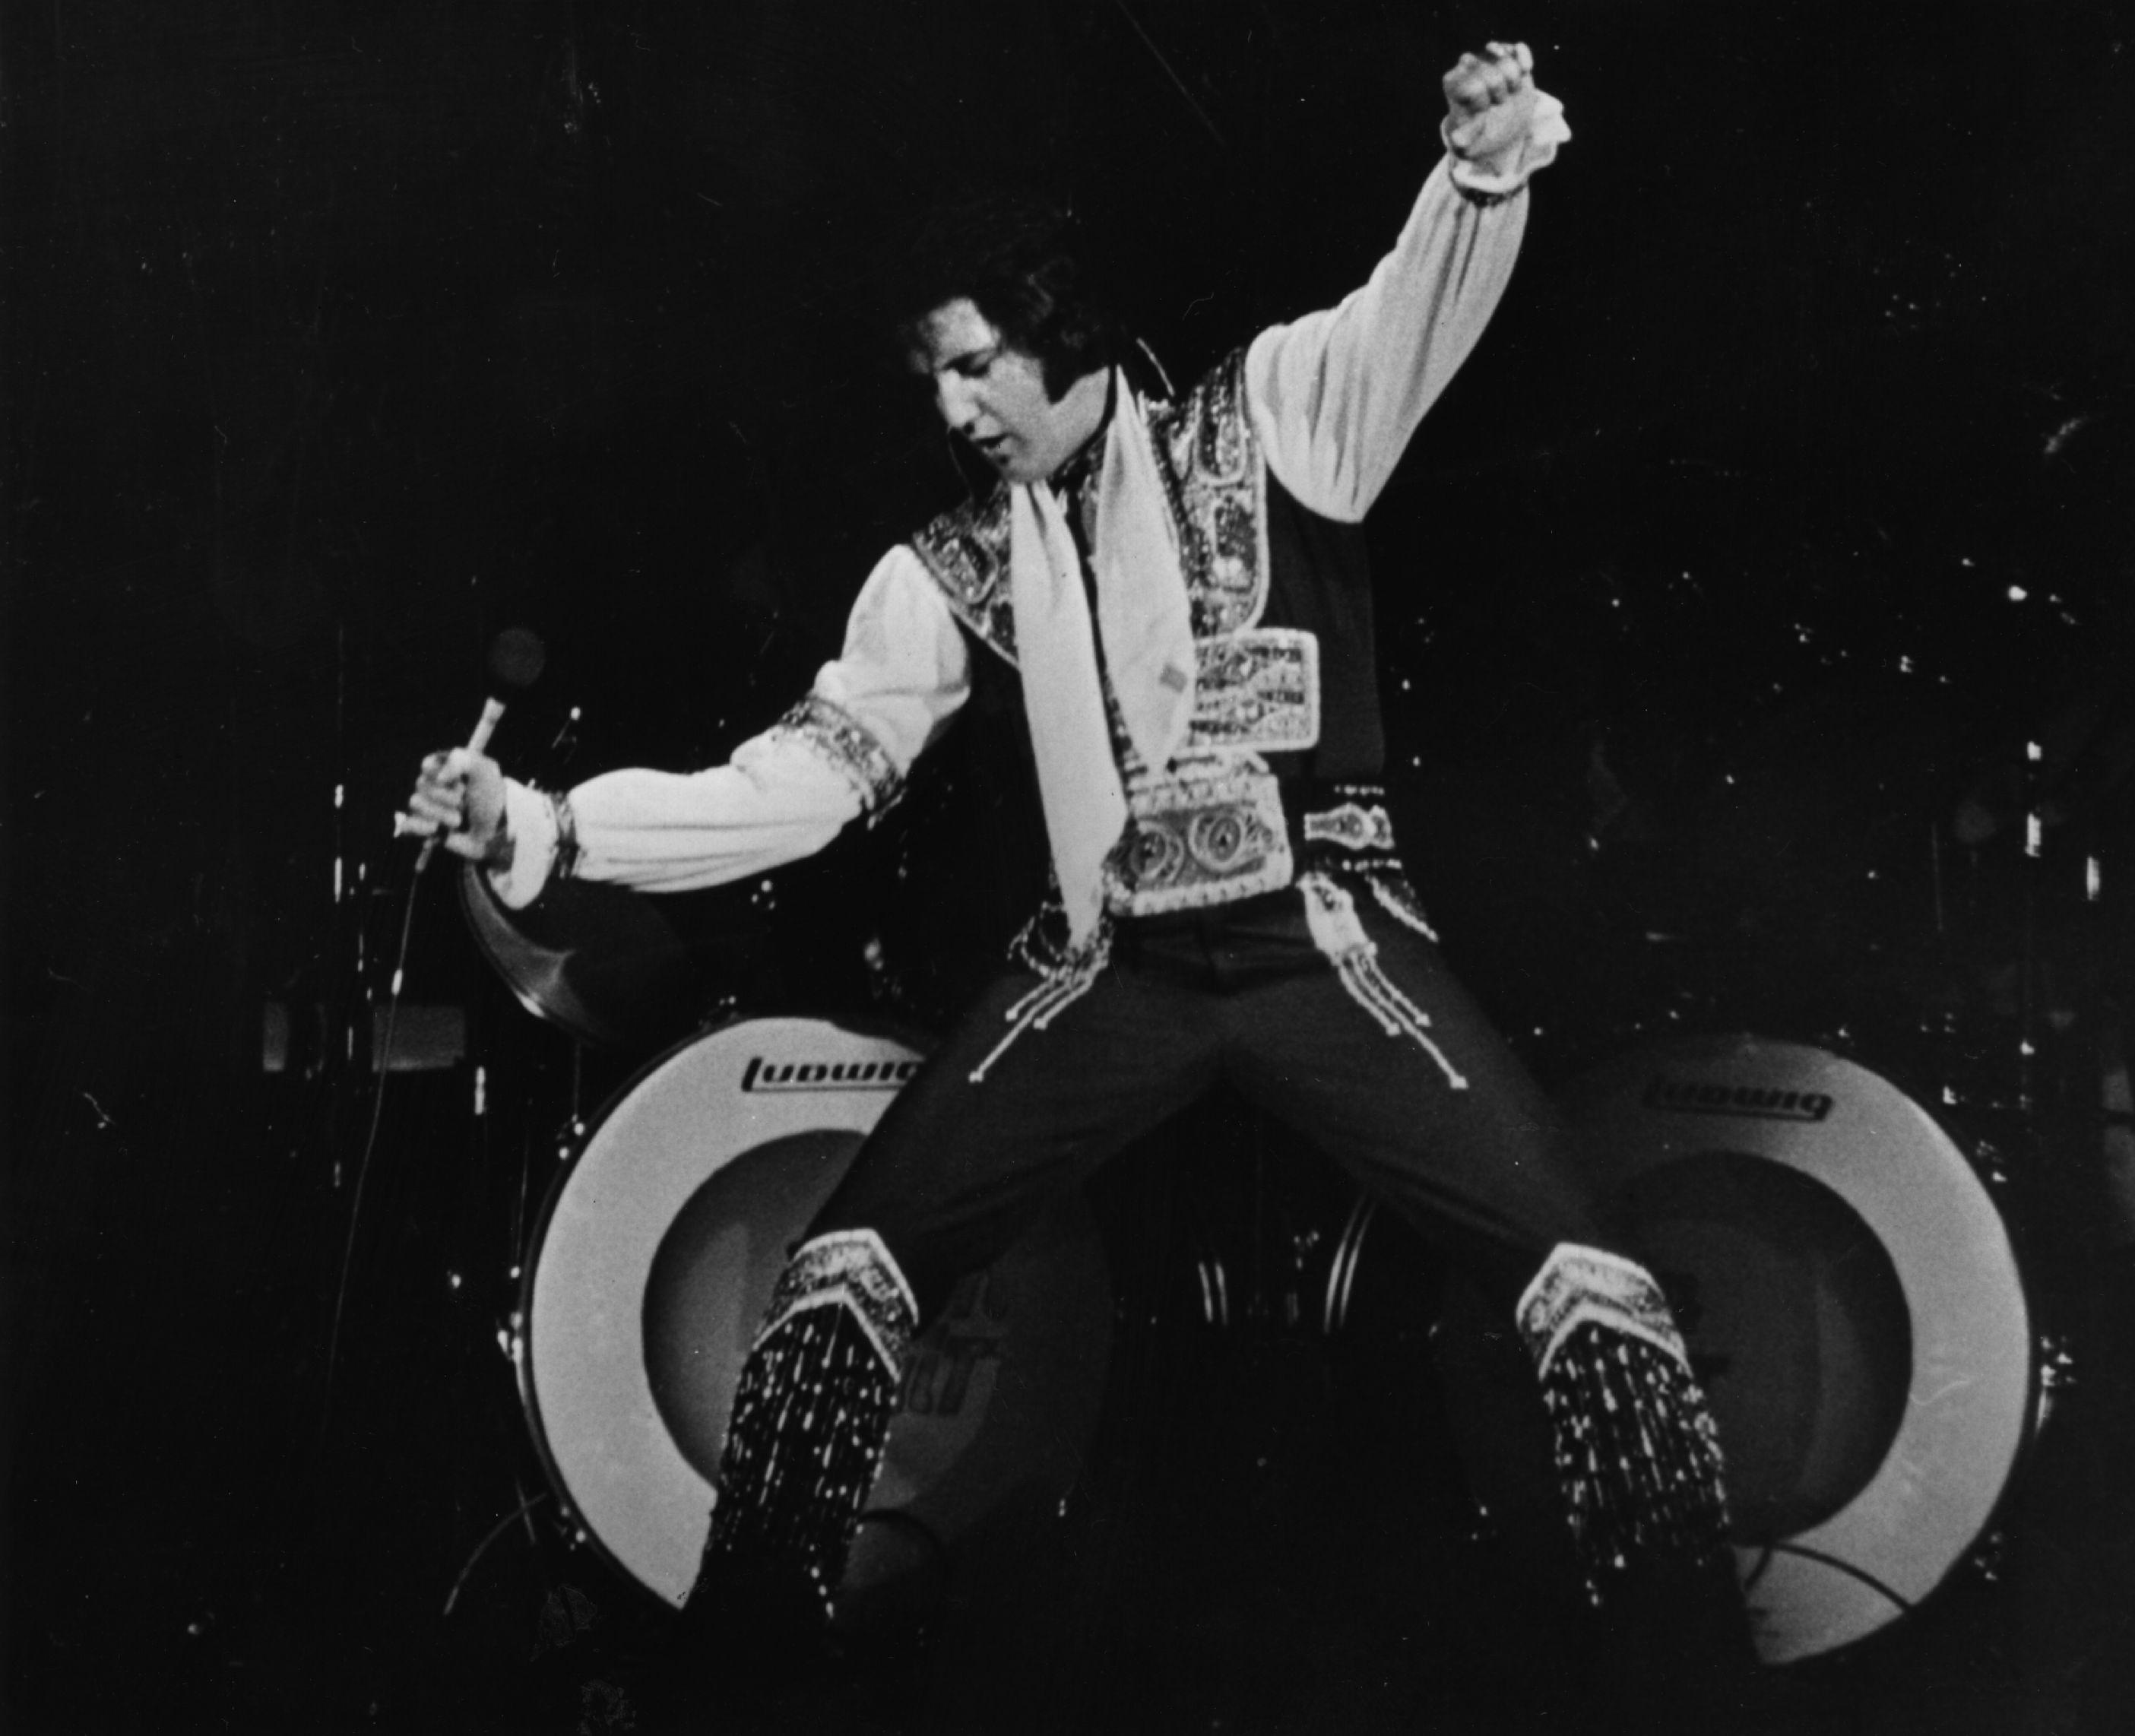 Elvis Presley reggaeton jóvenes música diablo